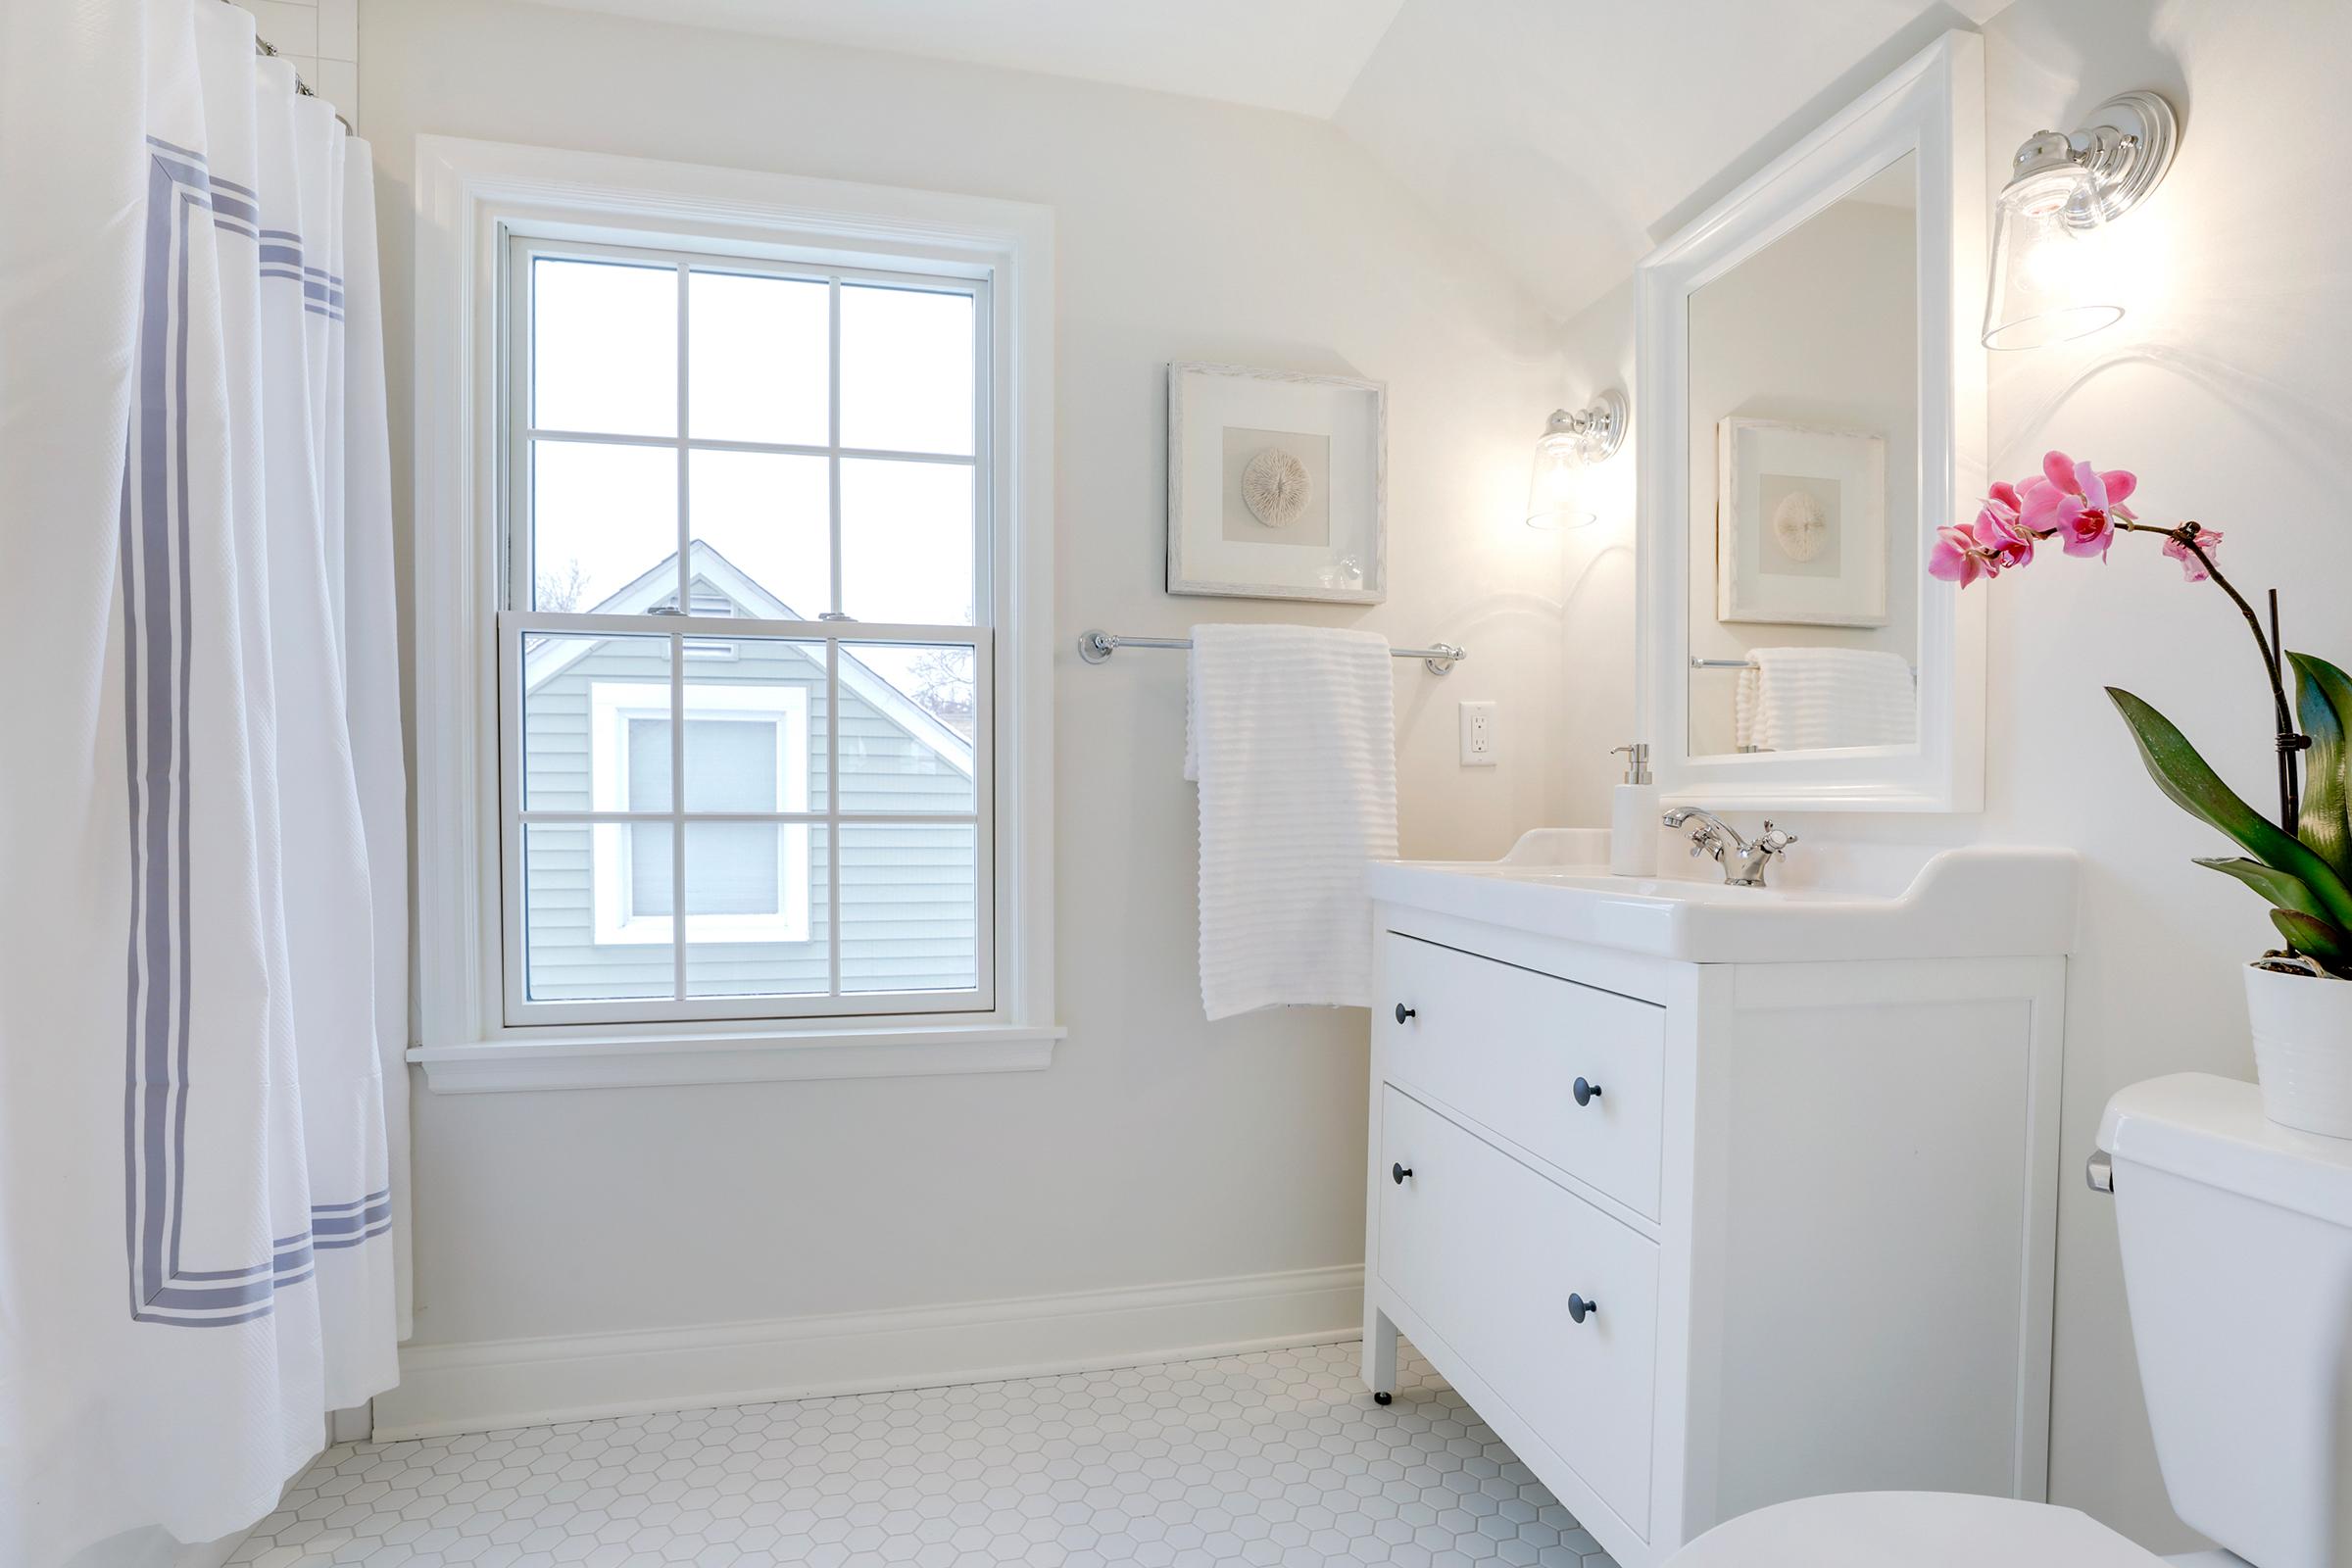 16-upper bath.jpg